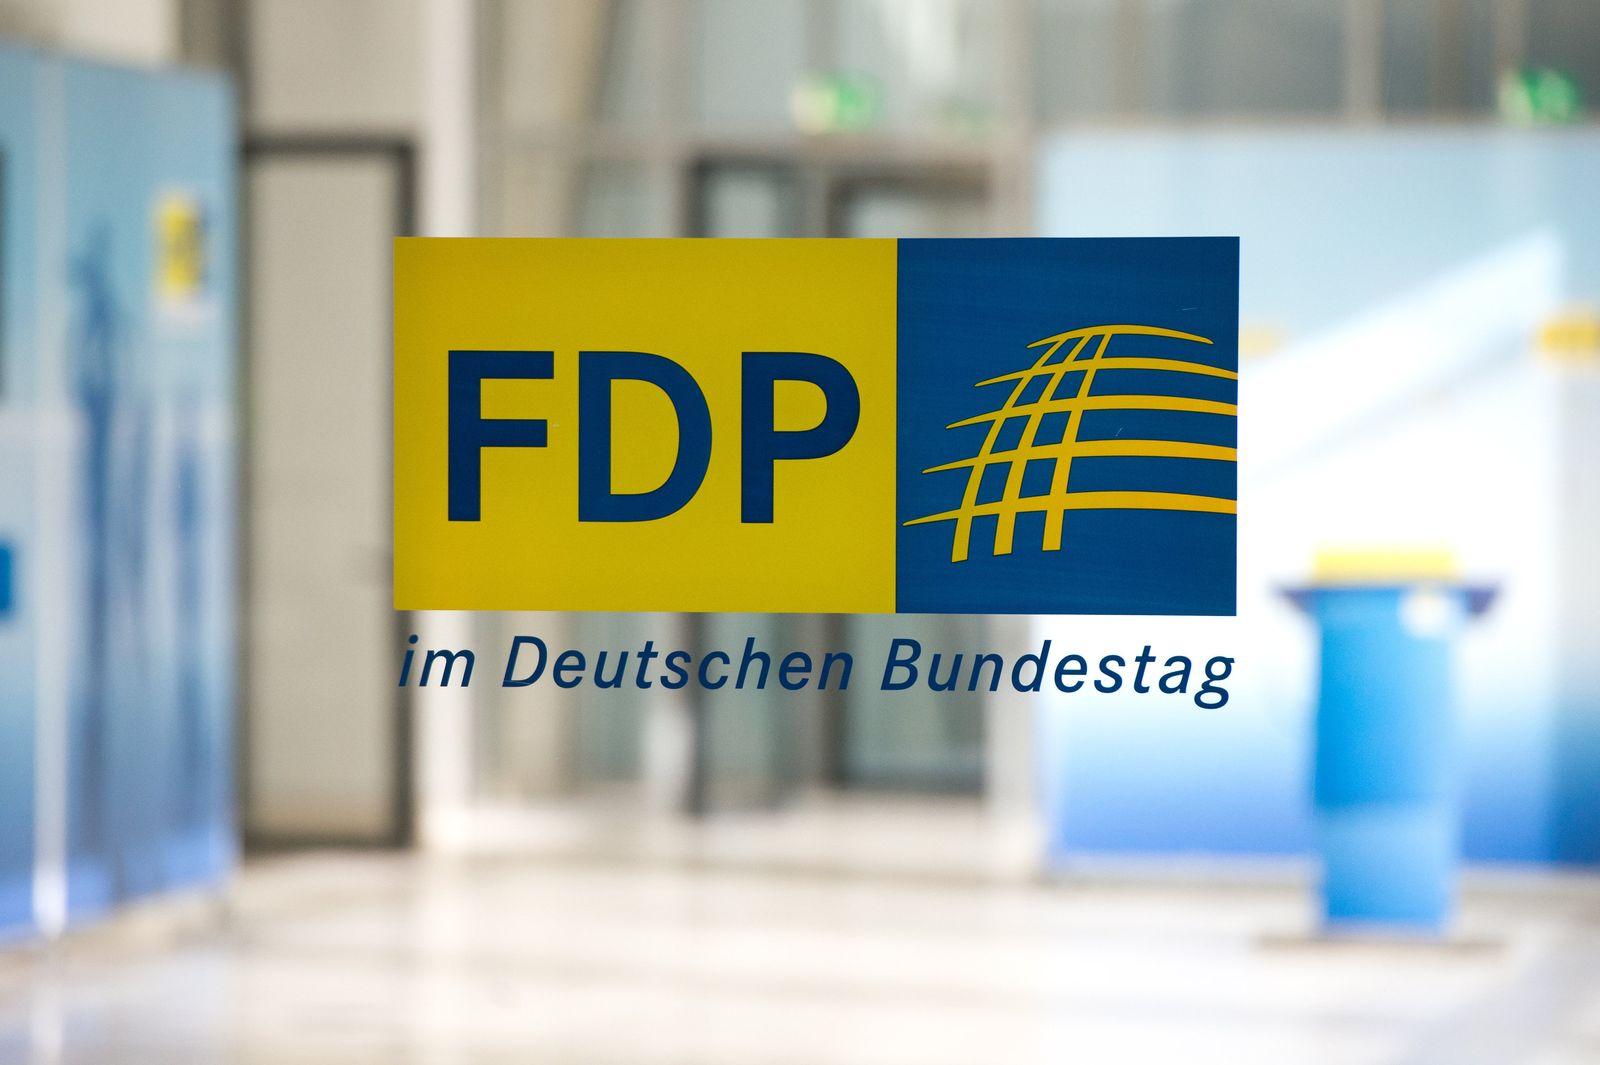 FDP Bundestag